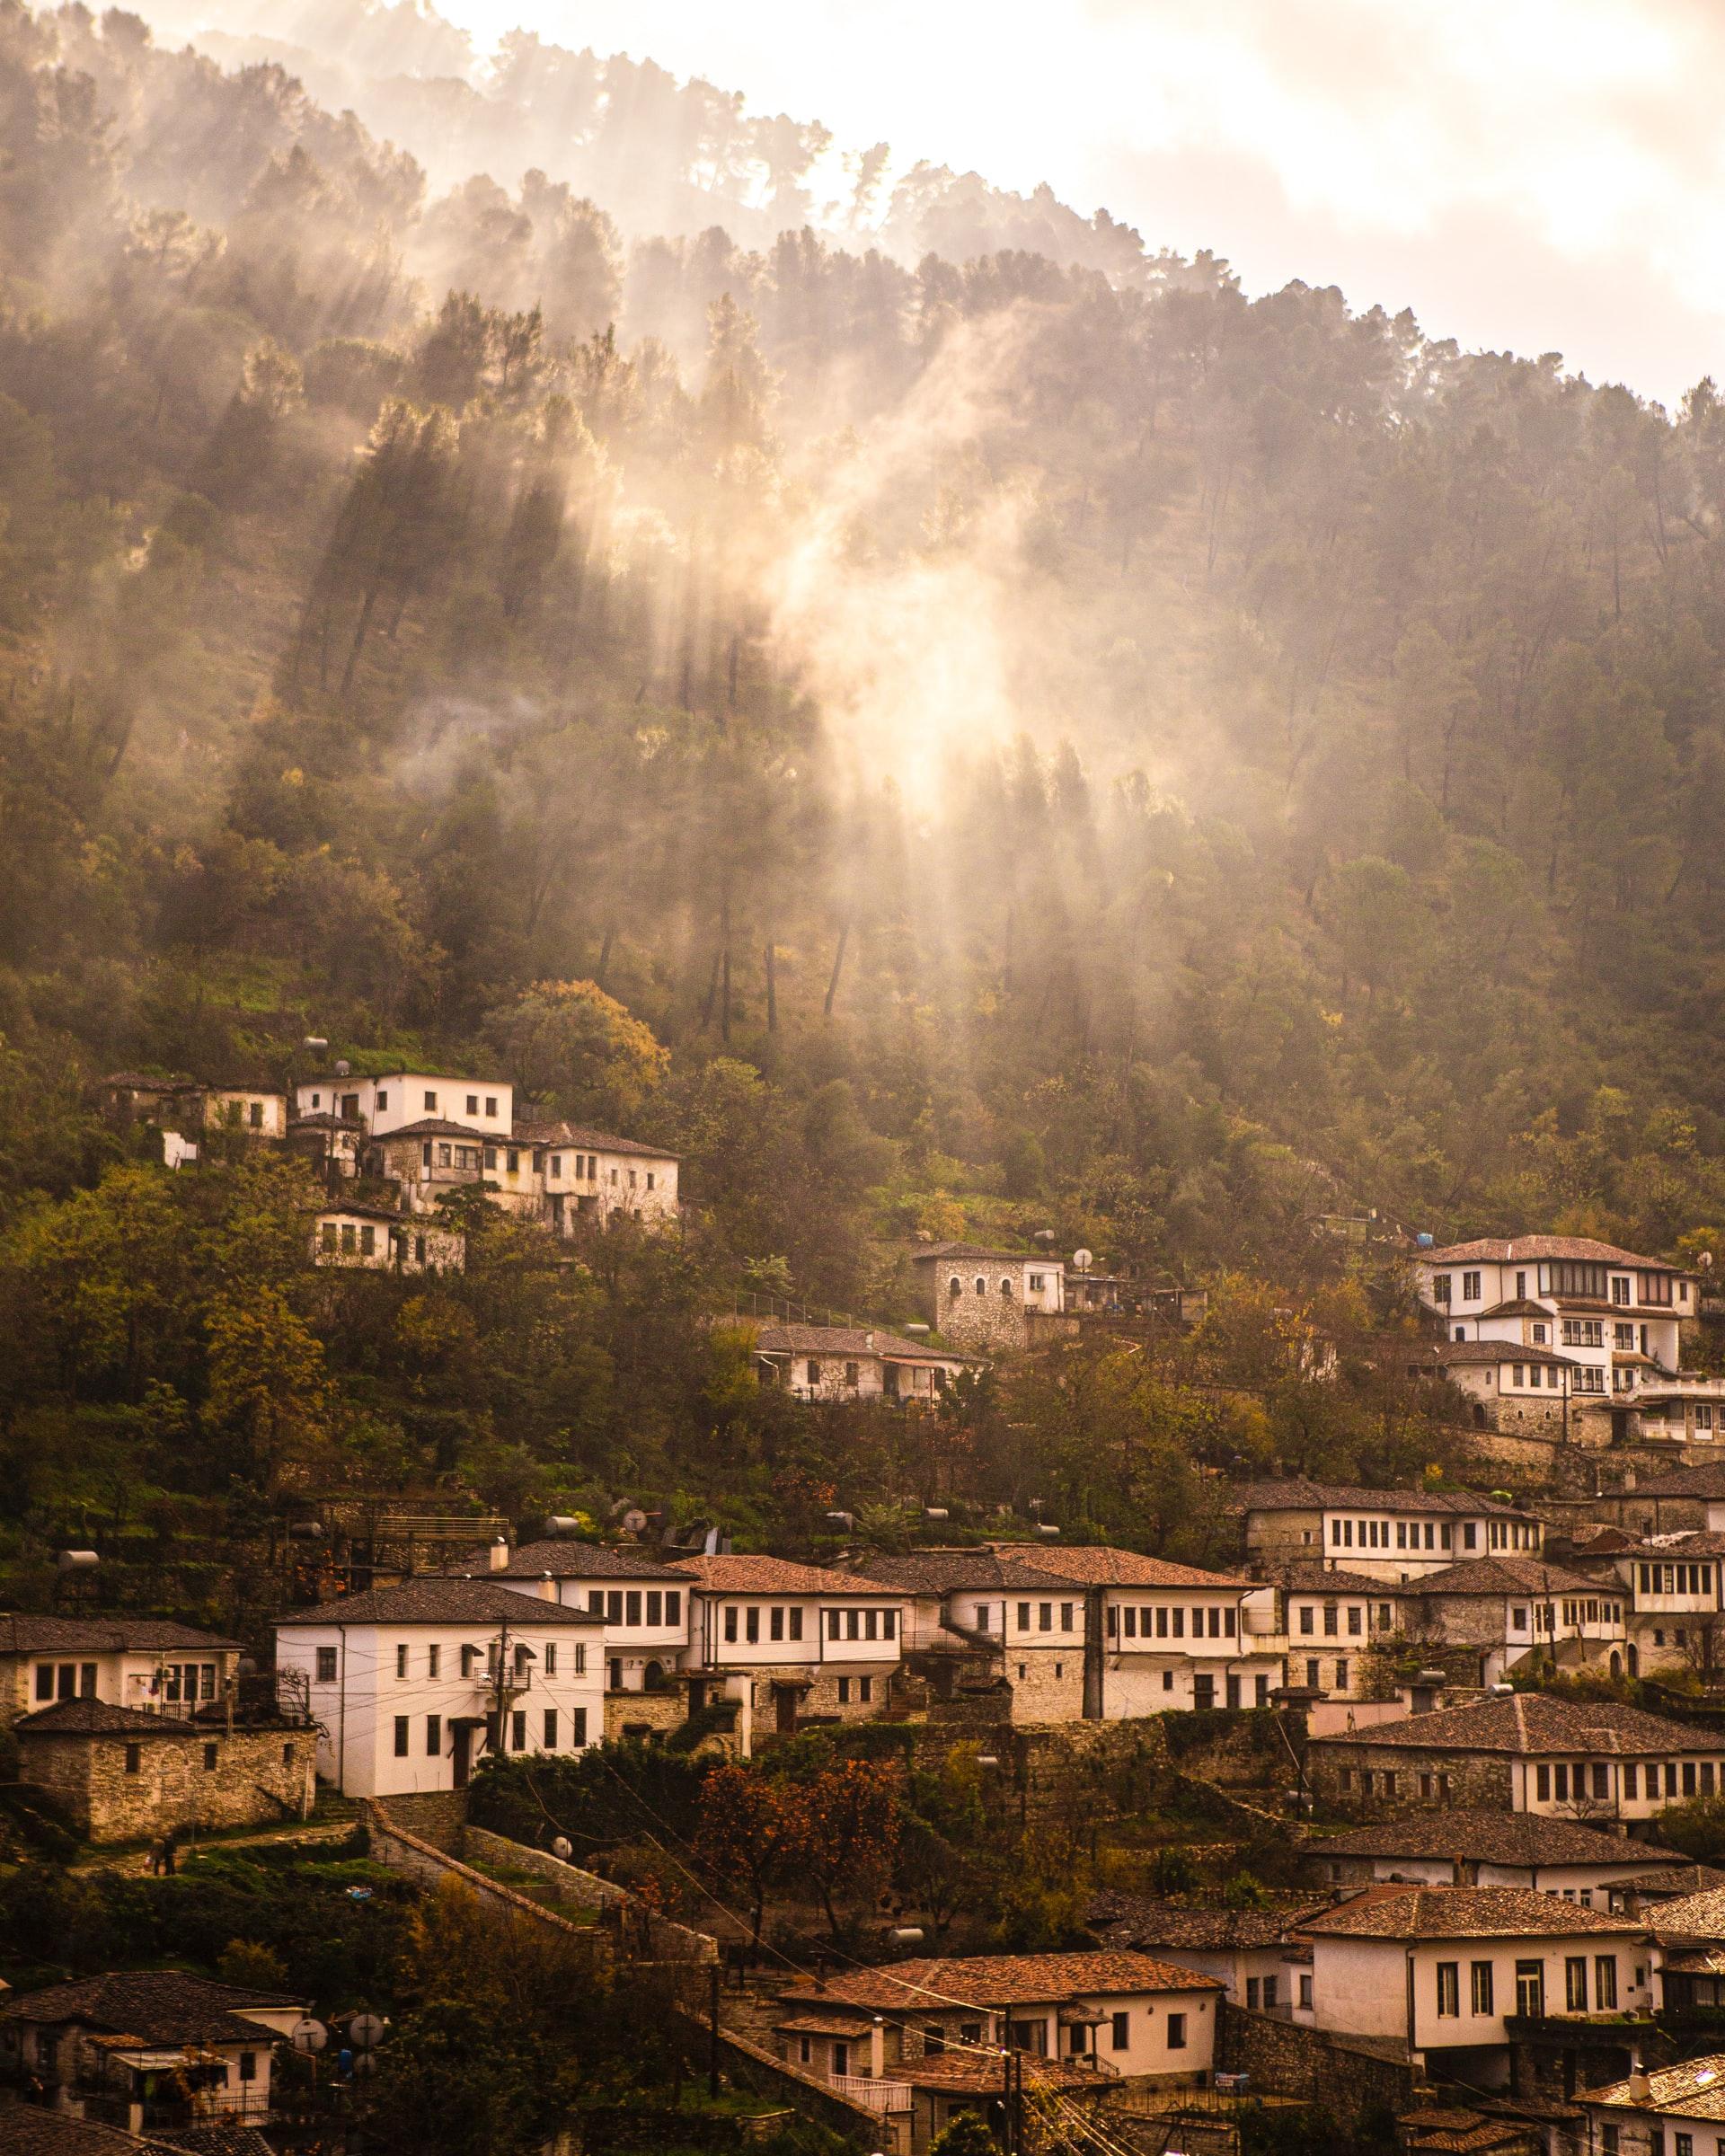 Berat, Albania, eastern europe's most walkable cities